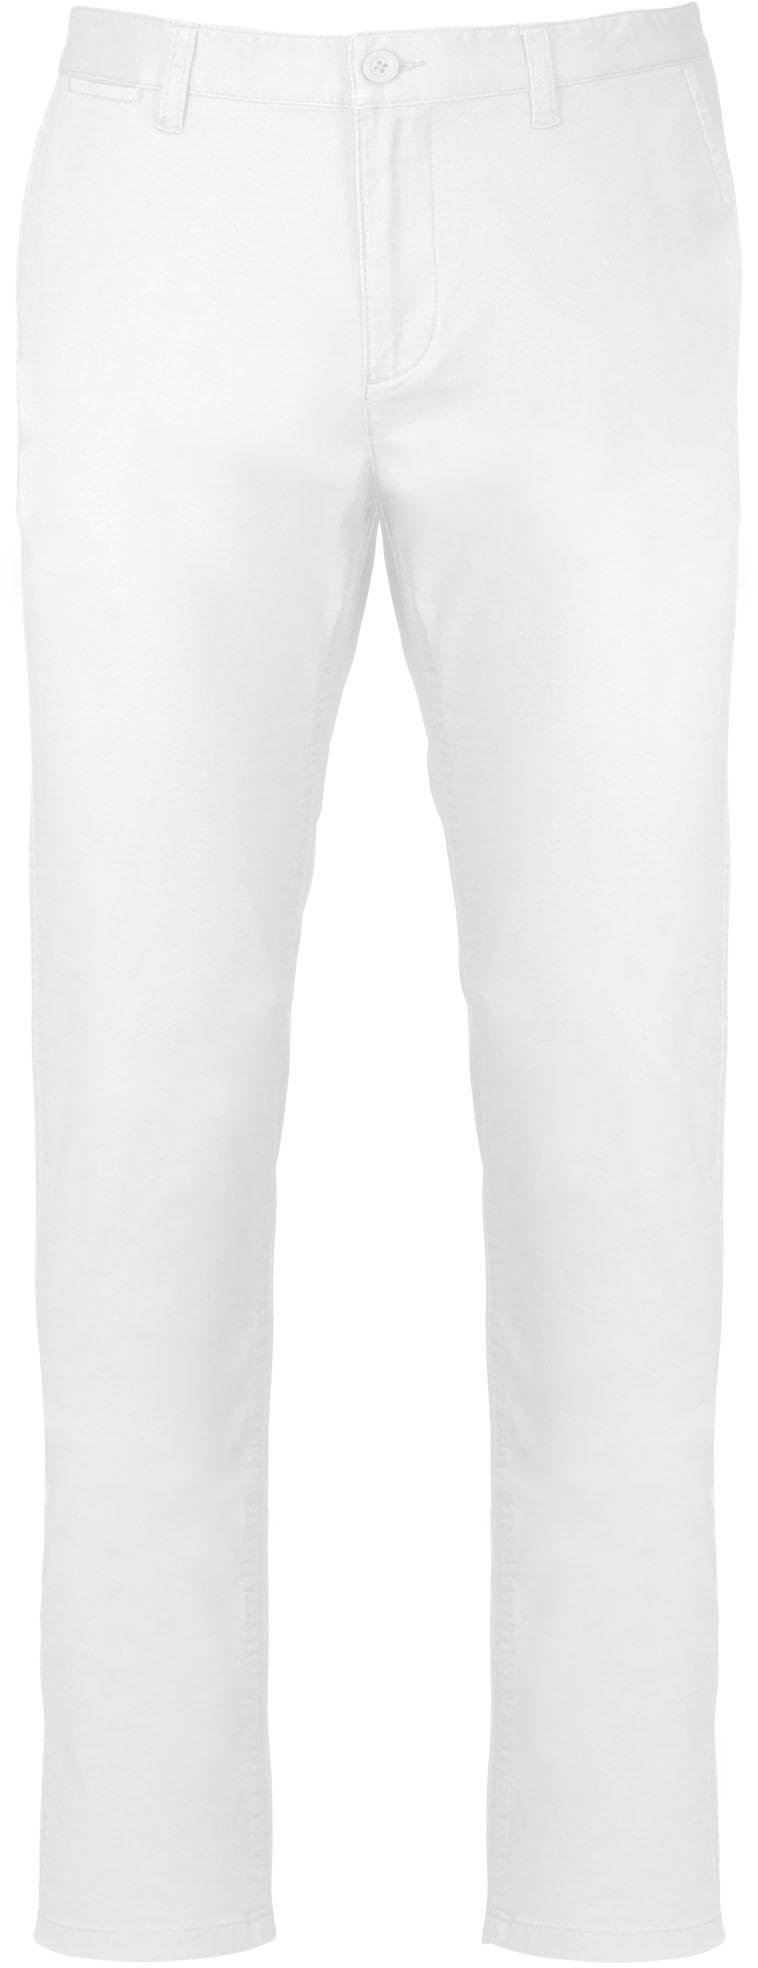 Pantalon chino homme - 2-1478-9